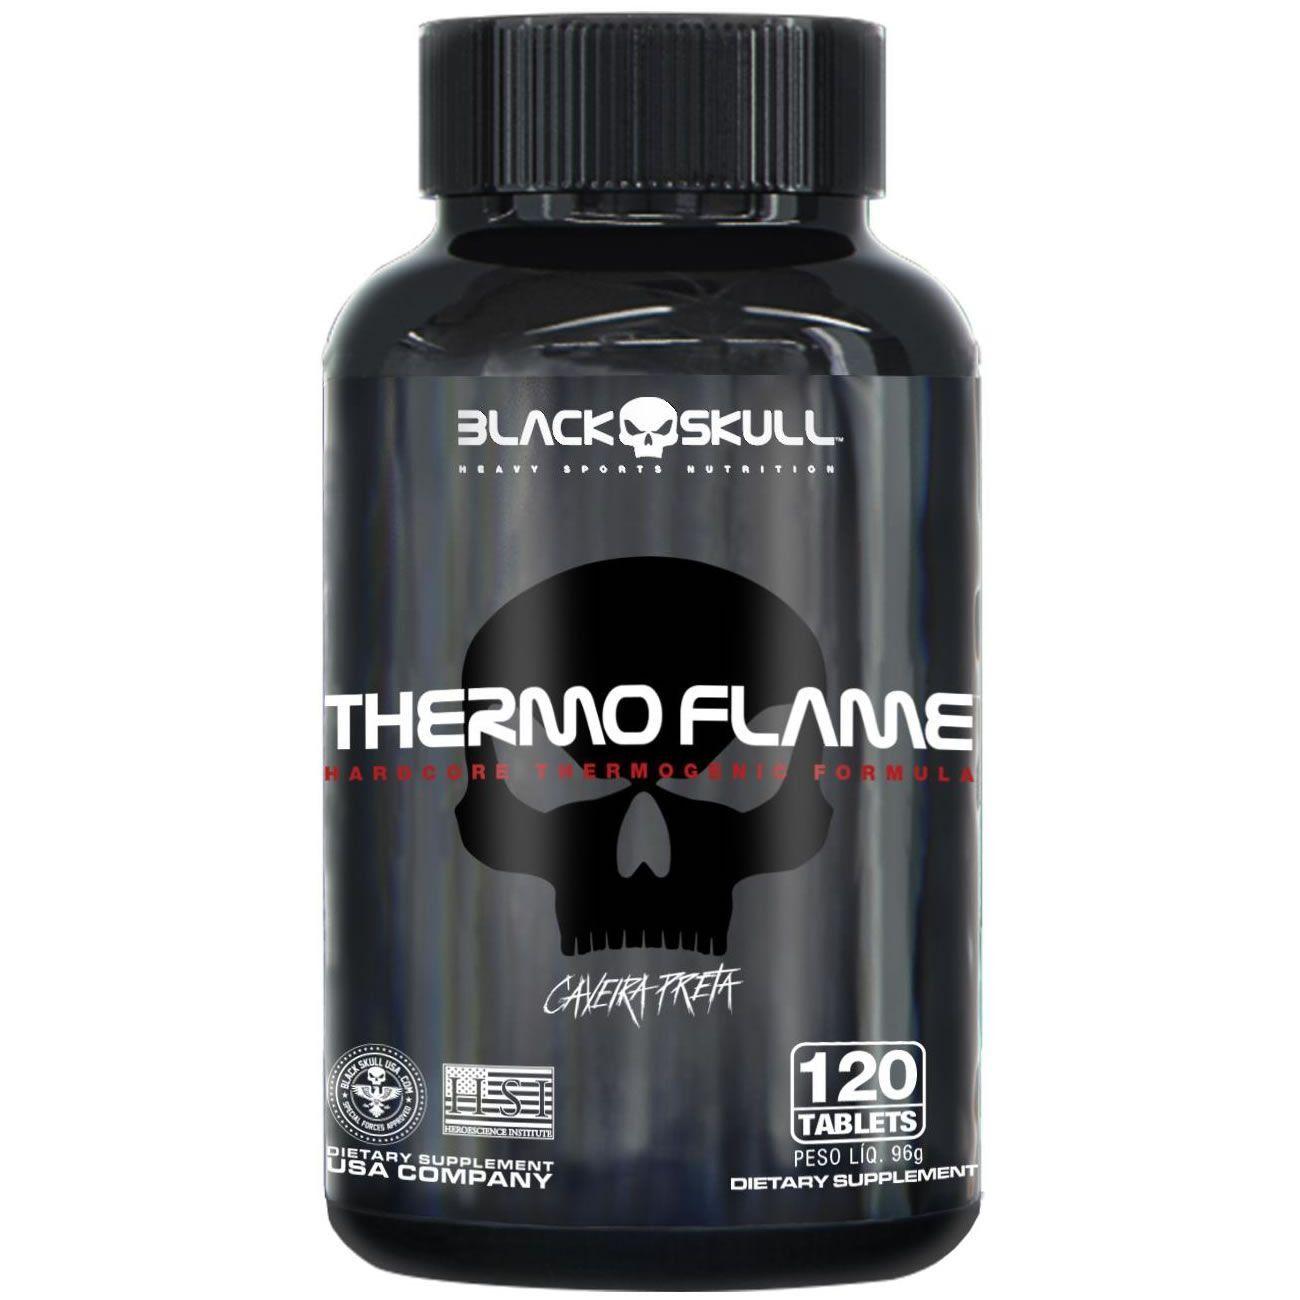 Termogênico Thermo Flame Caveira Preta Cafeína 120 Tabletes Black Skull